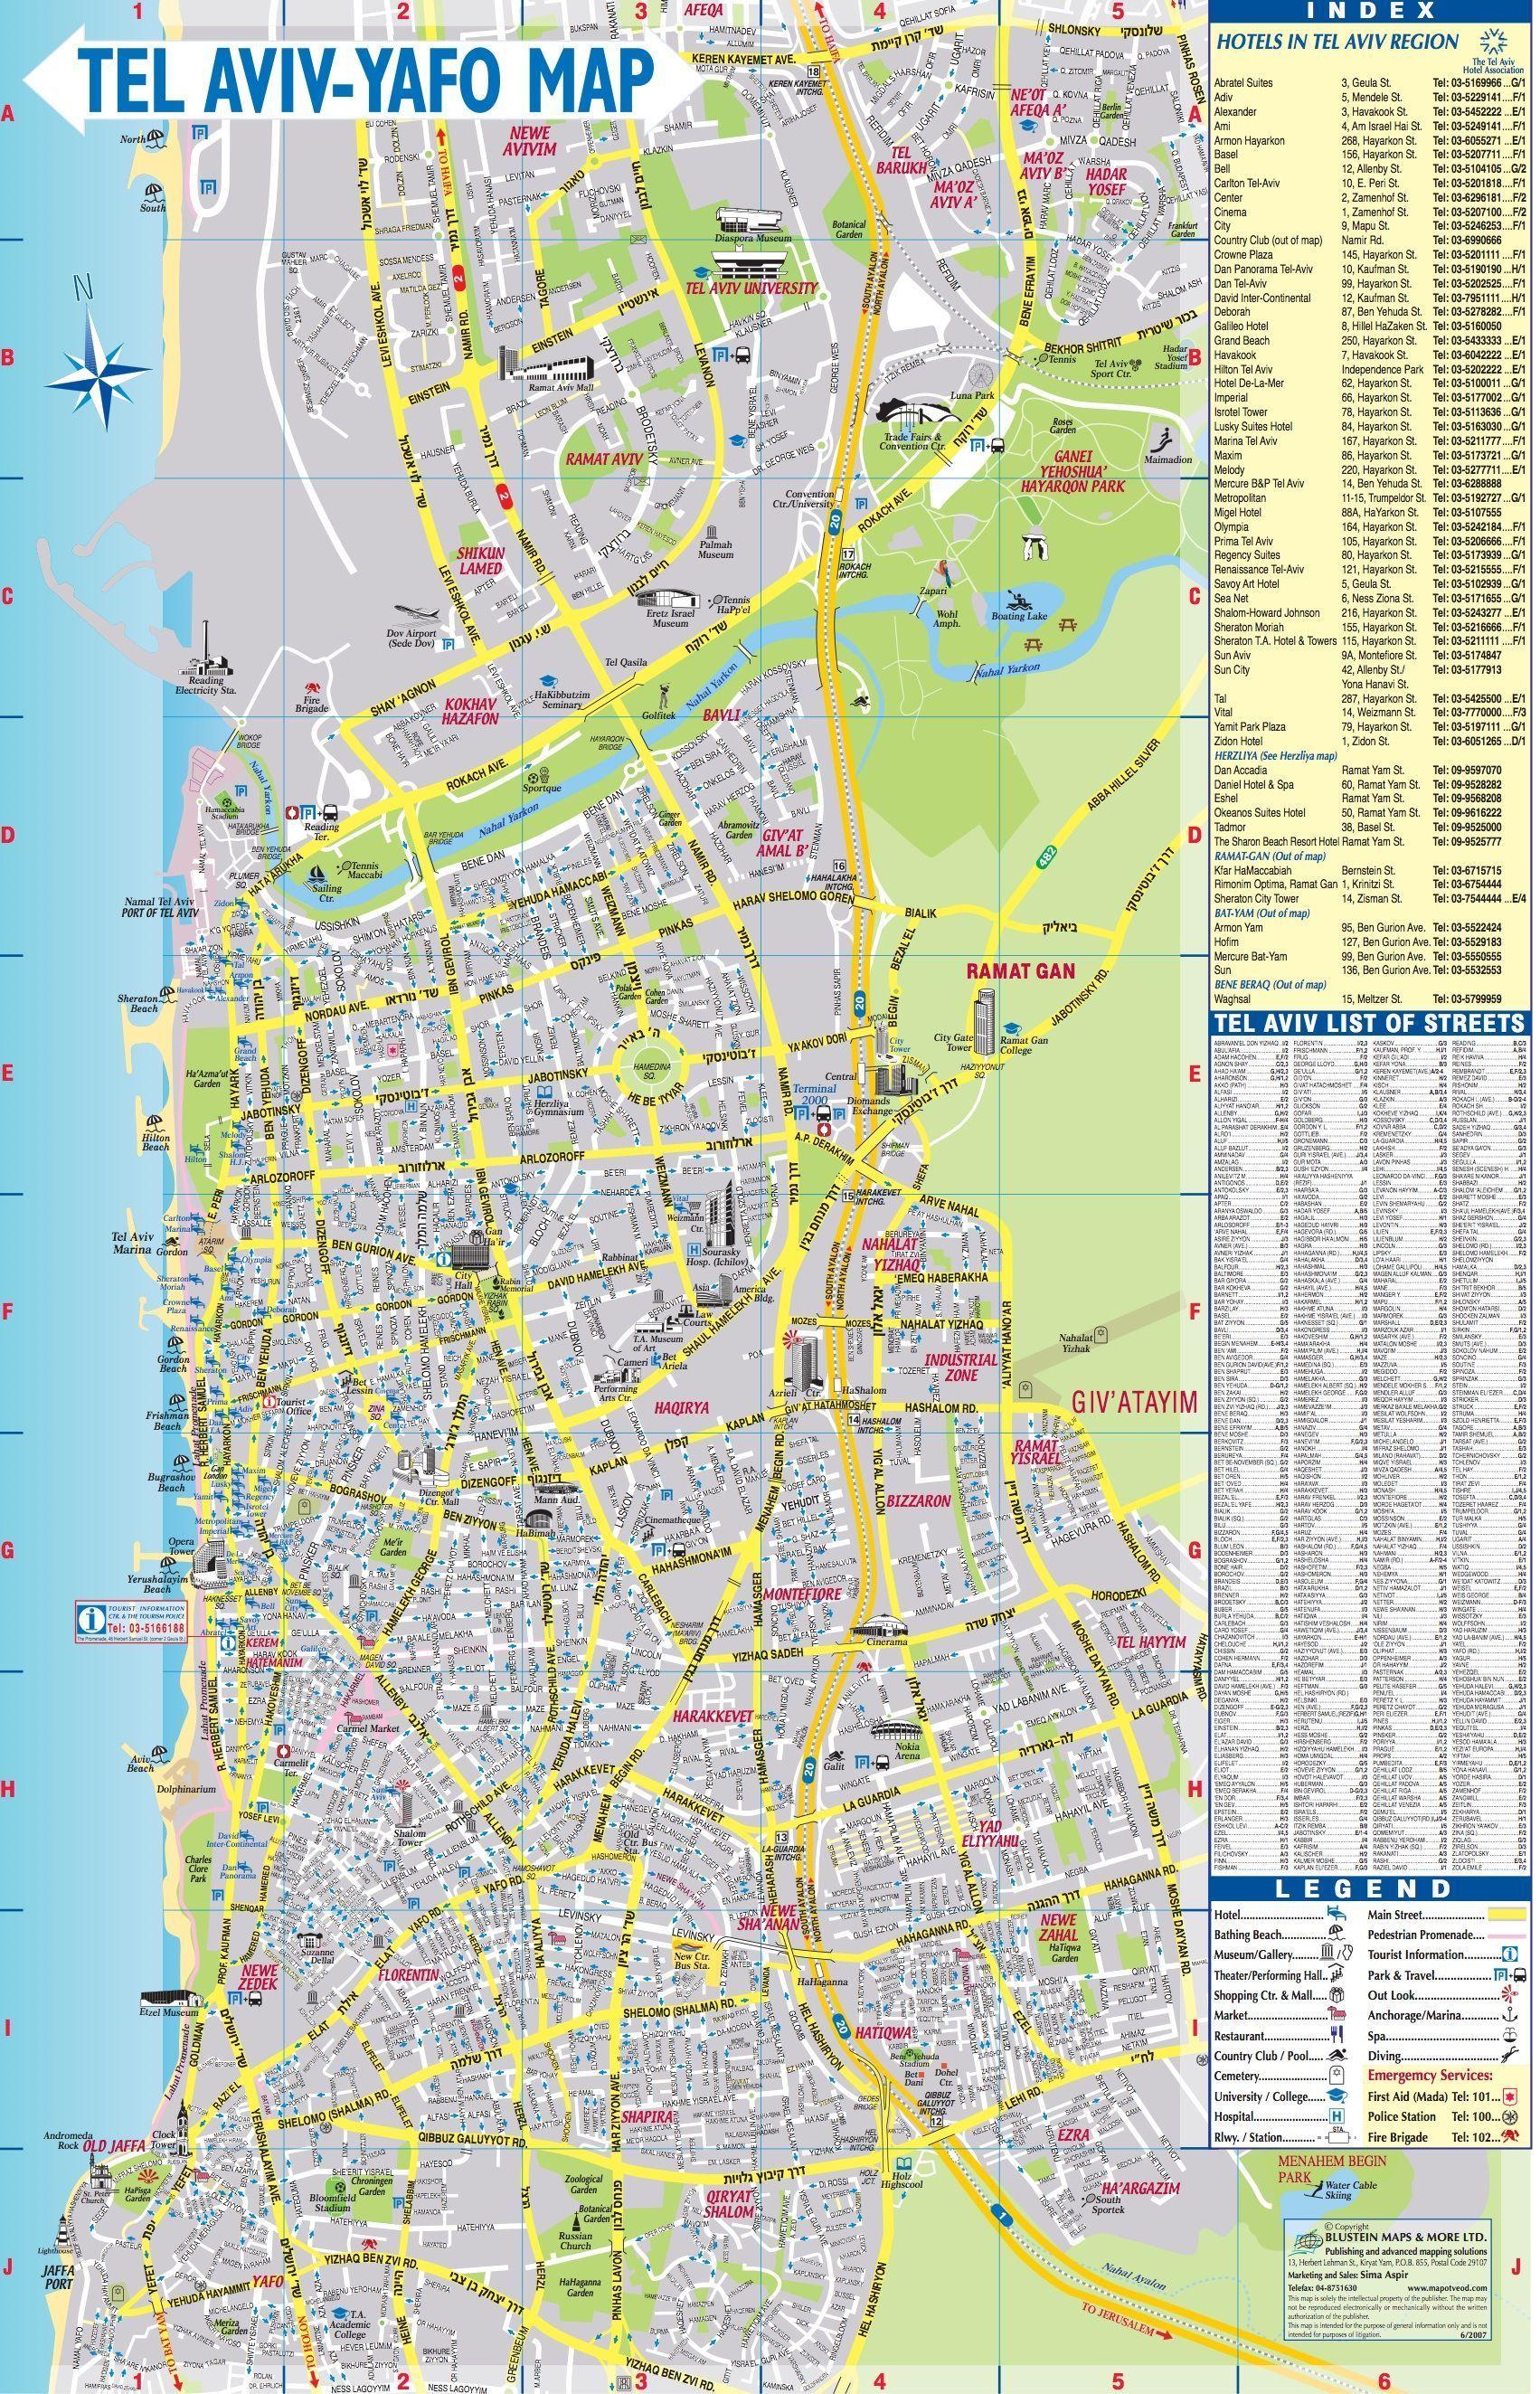 Tel Aviv Map-20151105-23